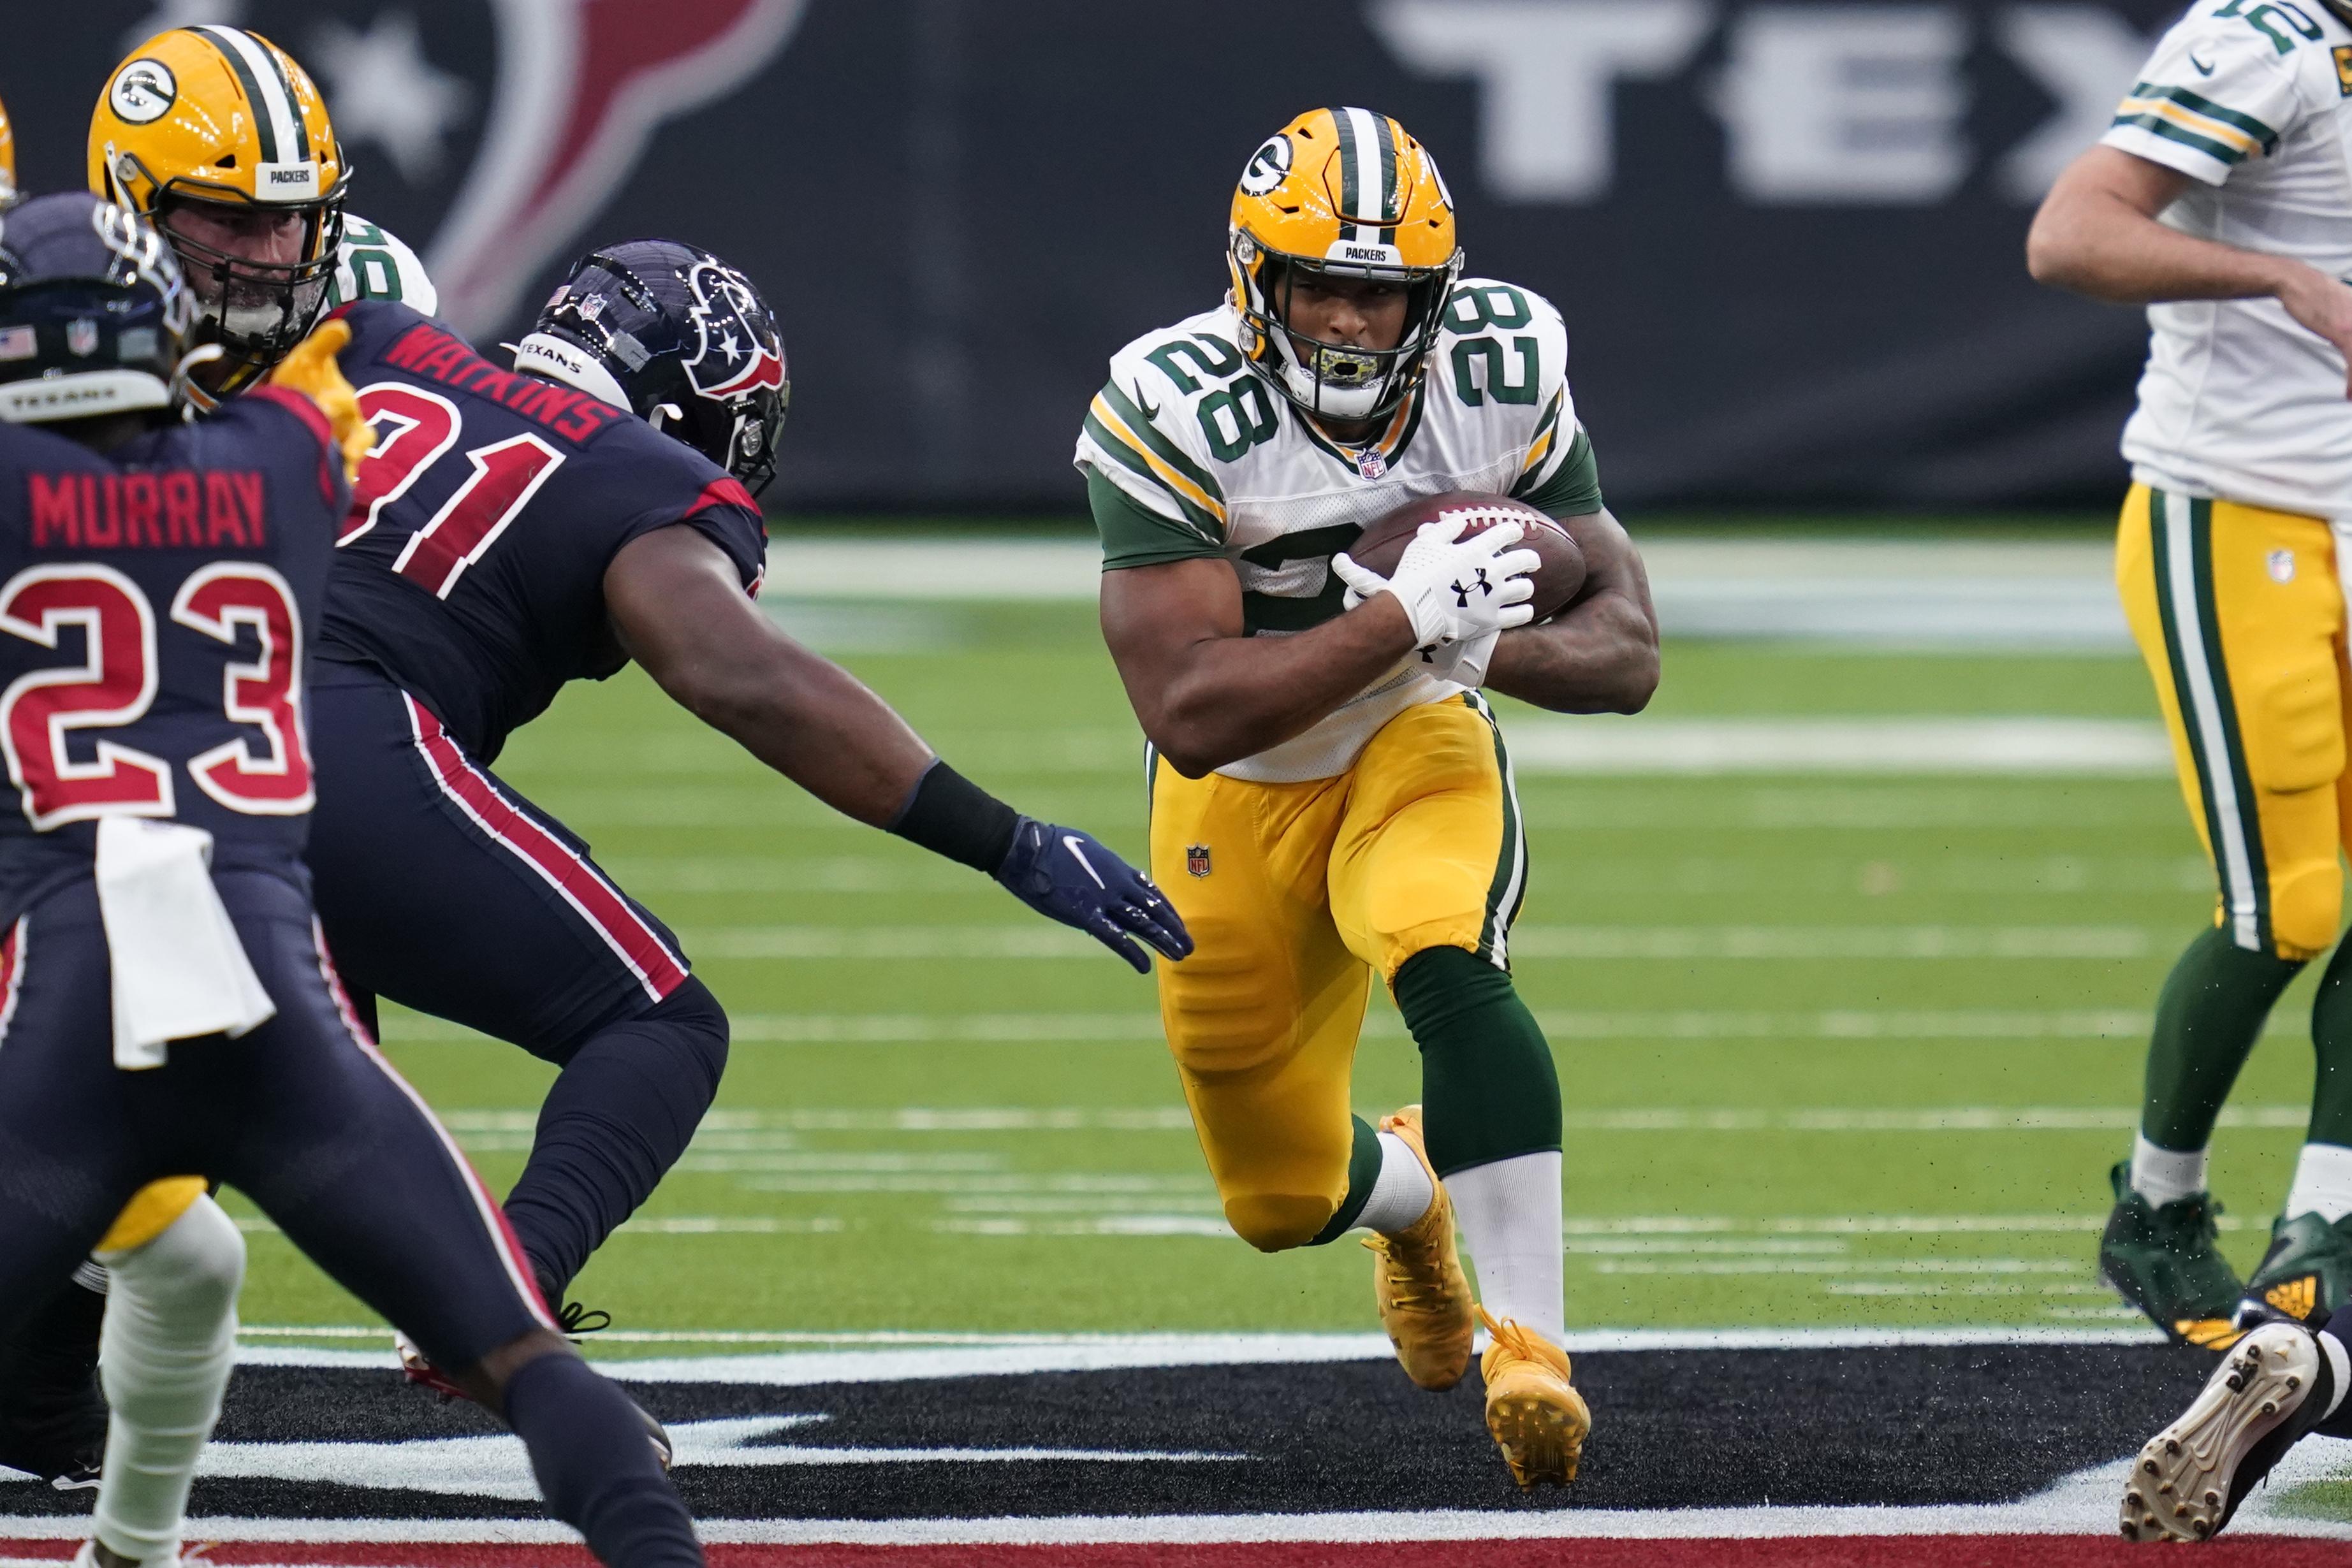 AJ Dillon has COVID-19: Green Bay Packers place Boston College alum on reserve list - masslive.com